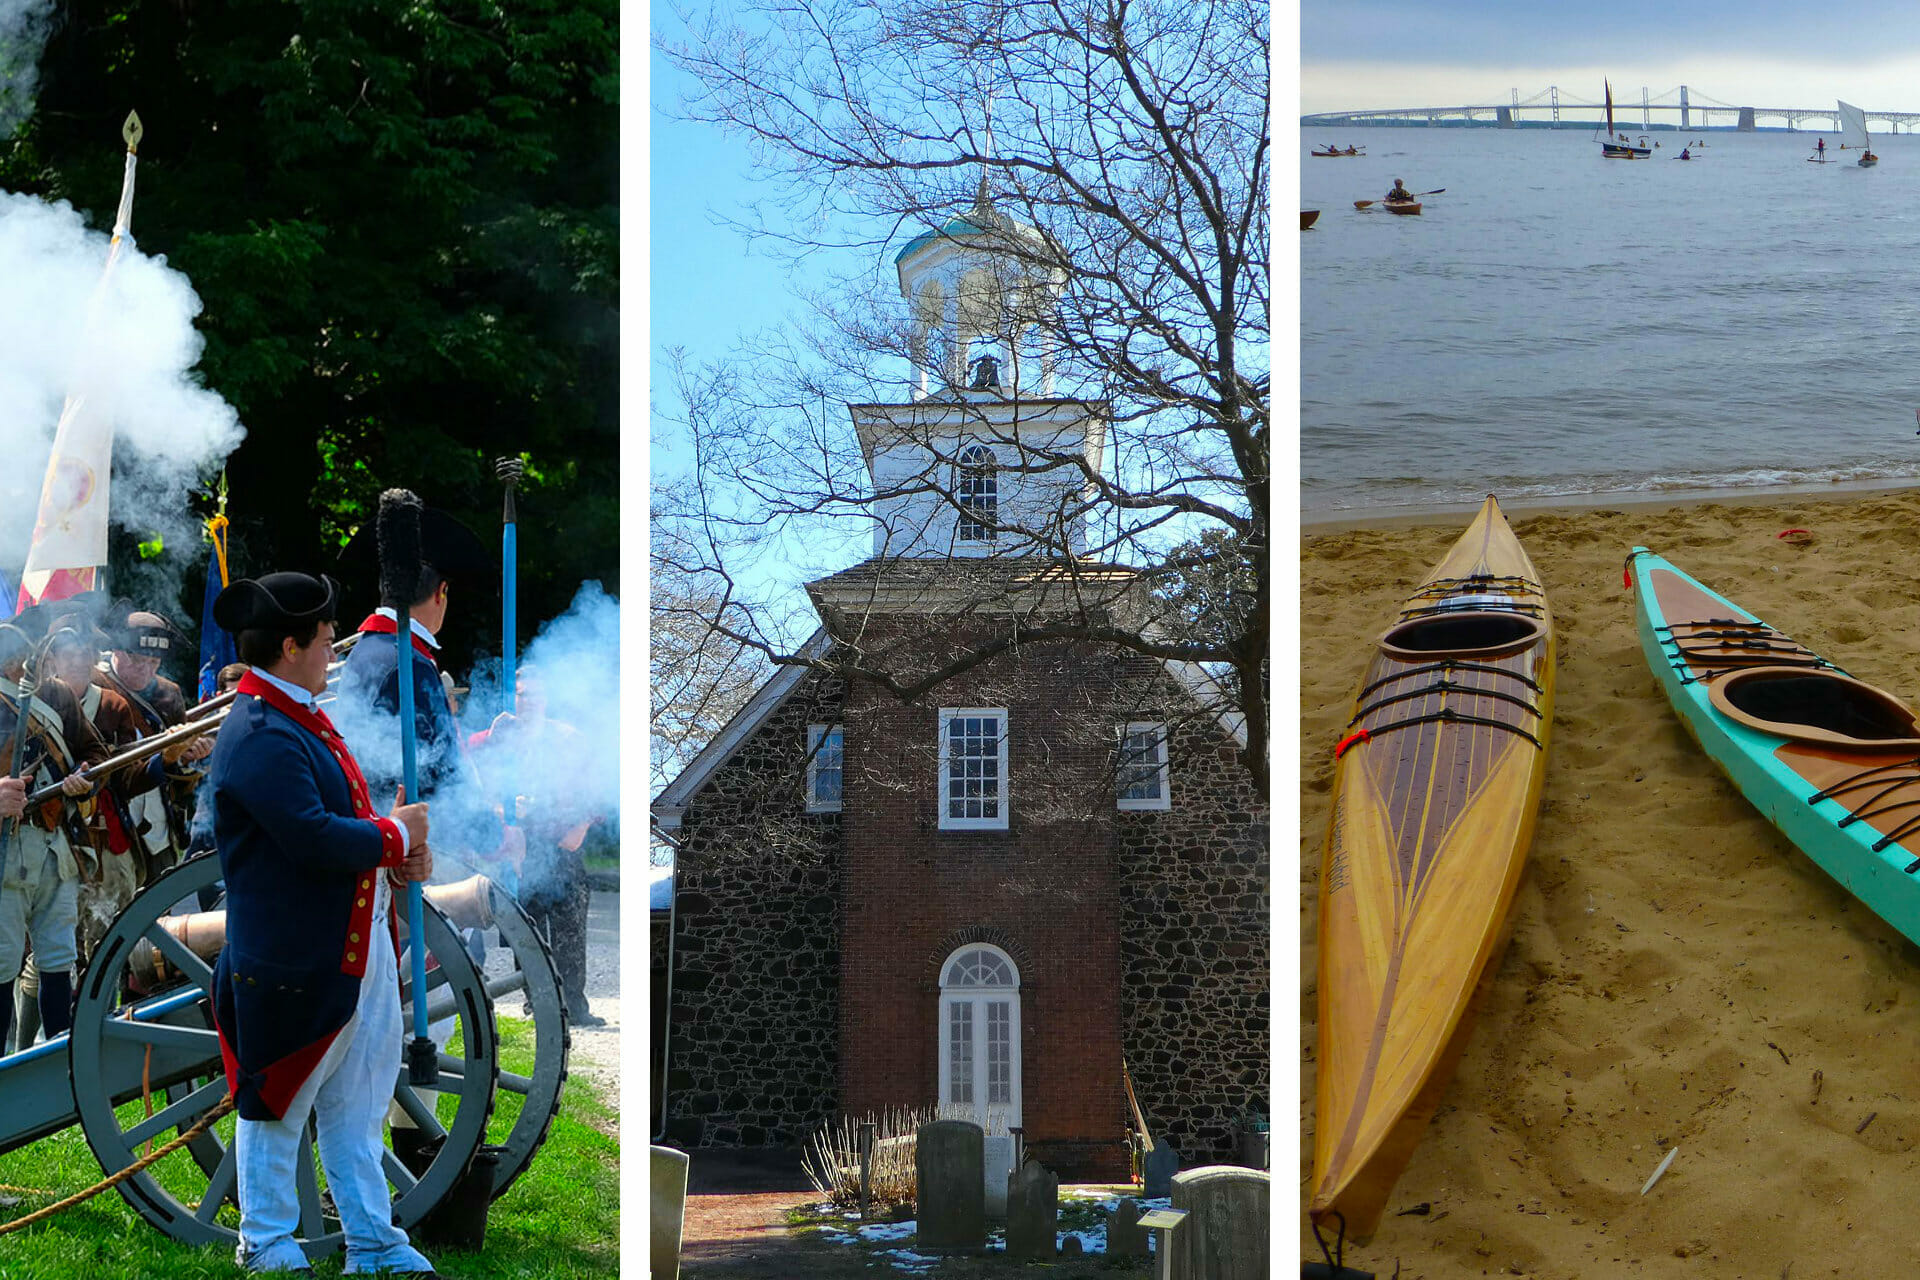 Delaware National Parks 2021: Insider Tips for all 4 Sites via @allamericanatlas